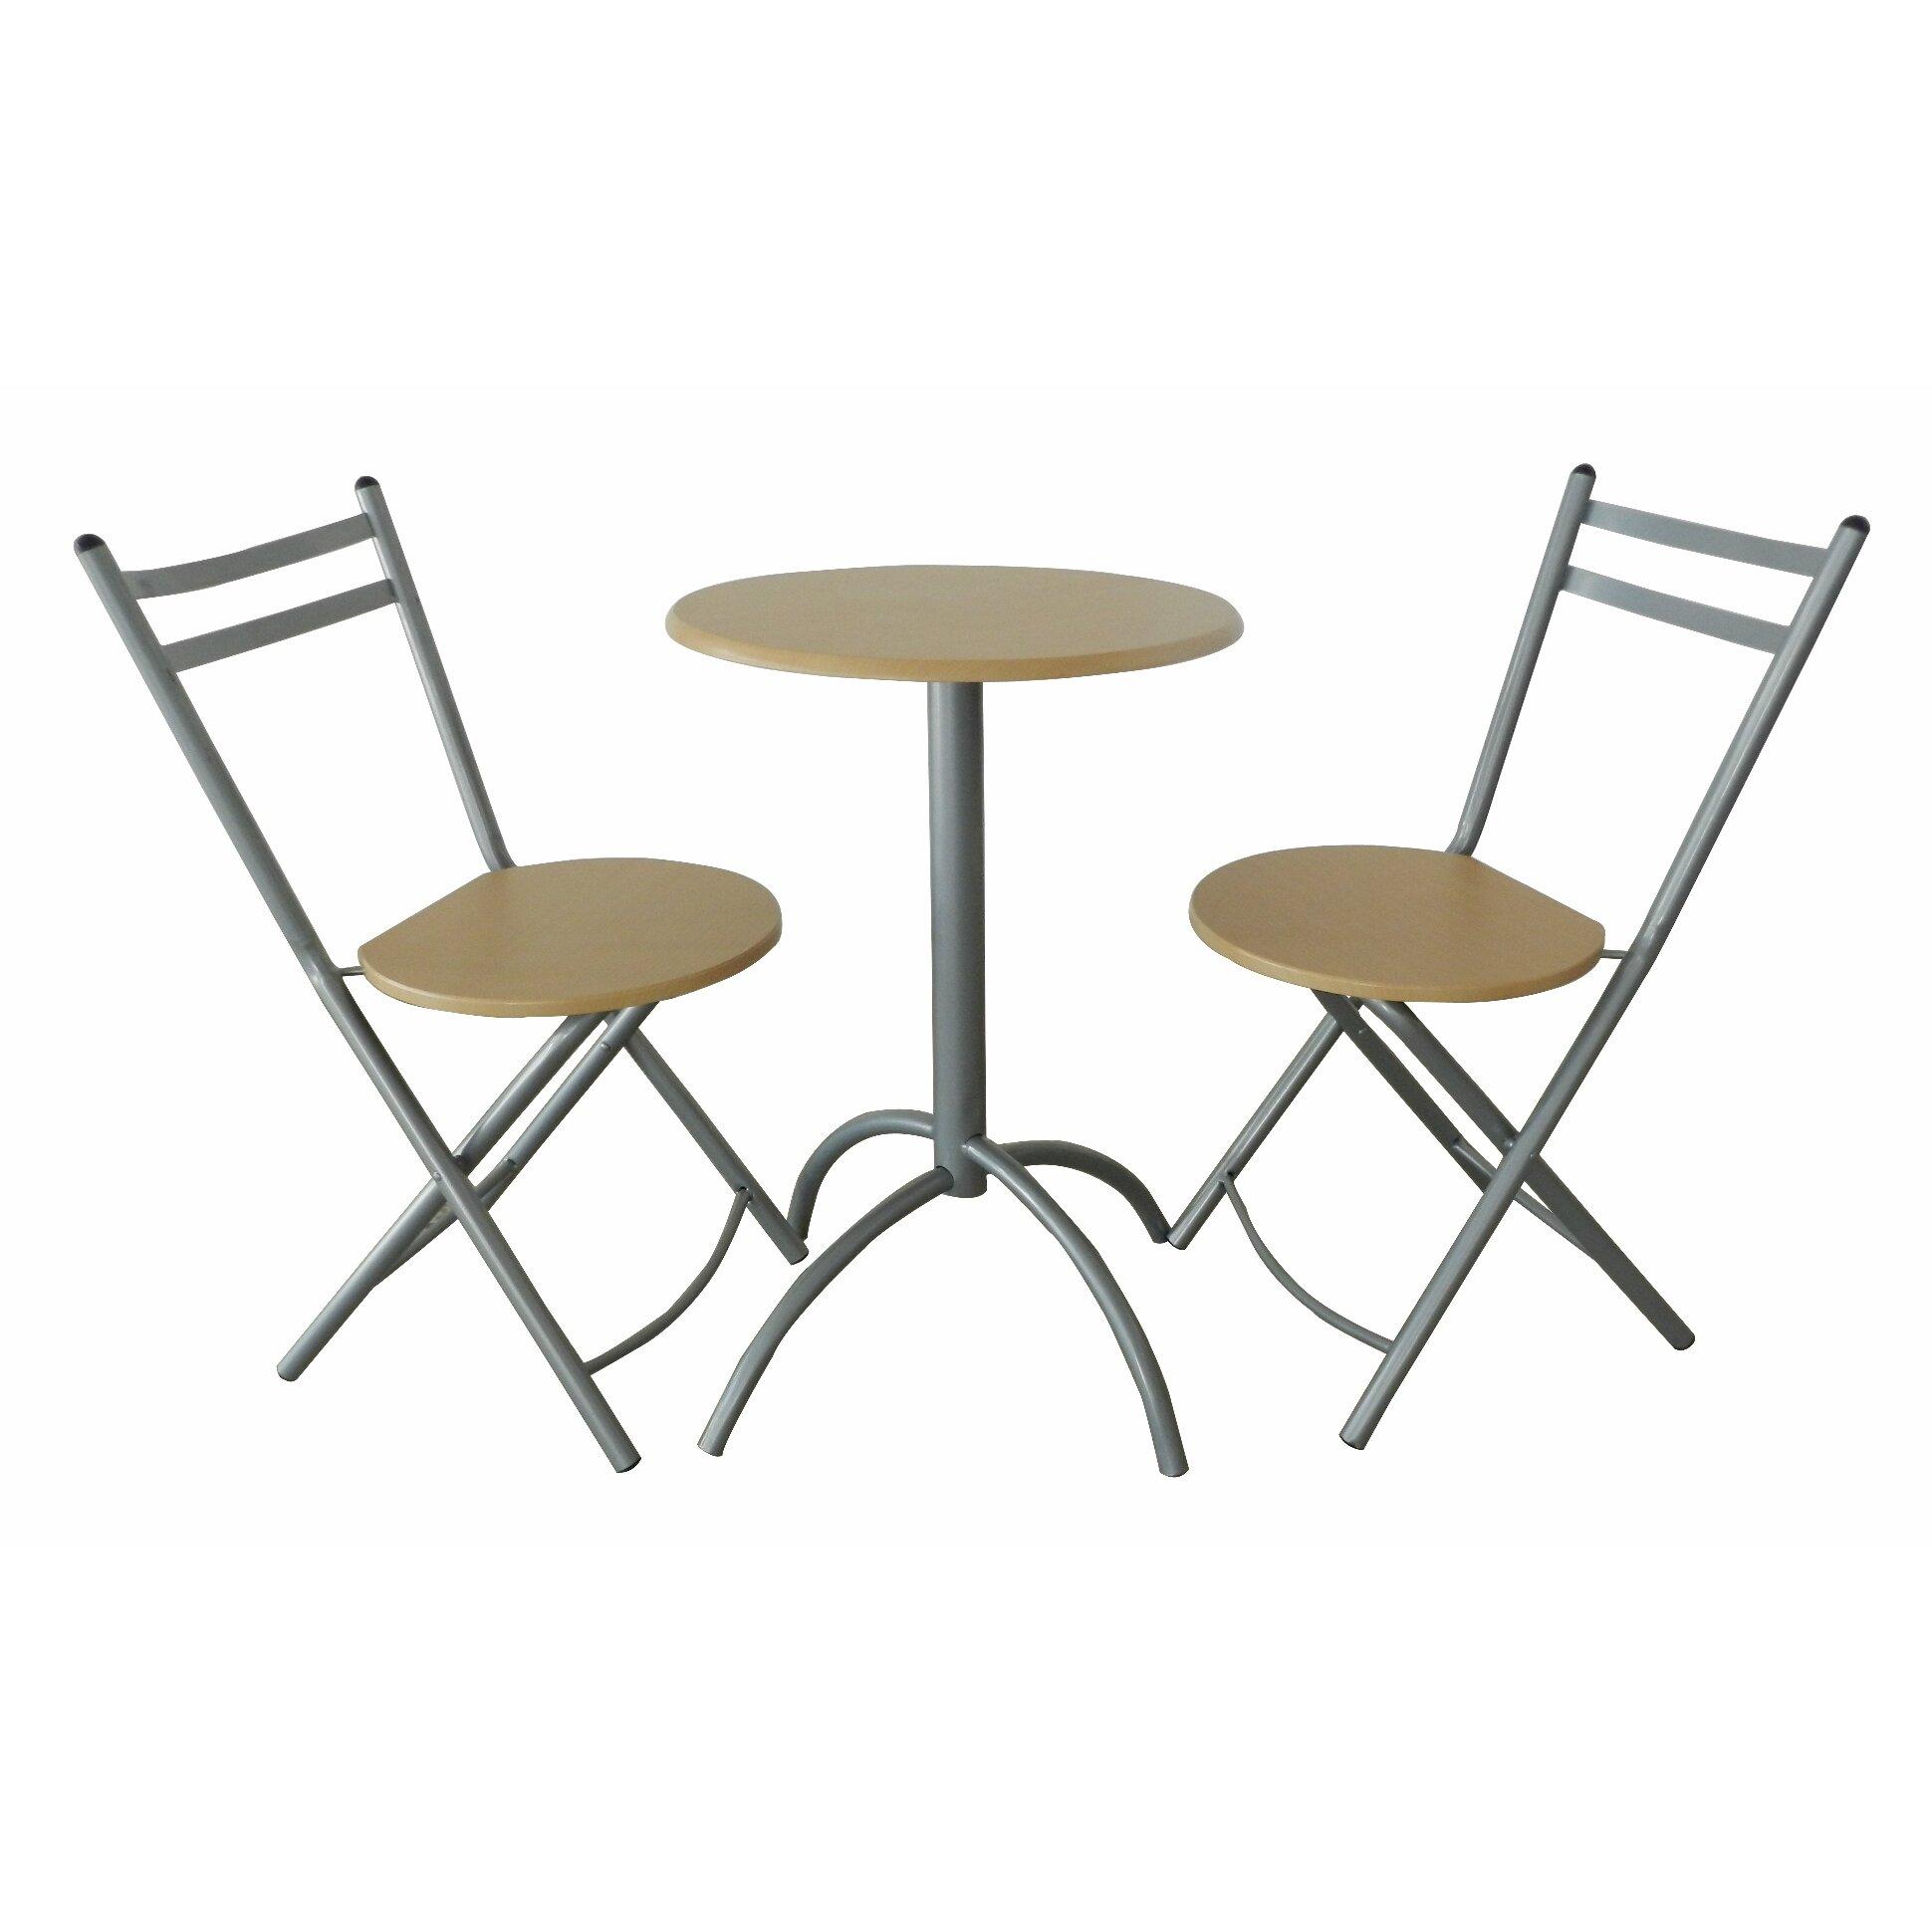 2 piece dining